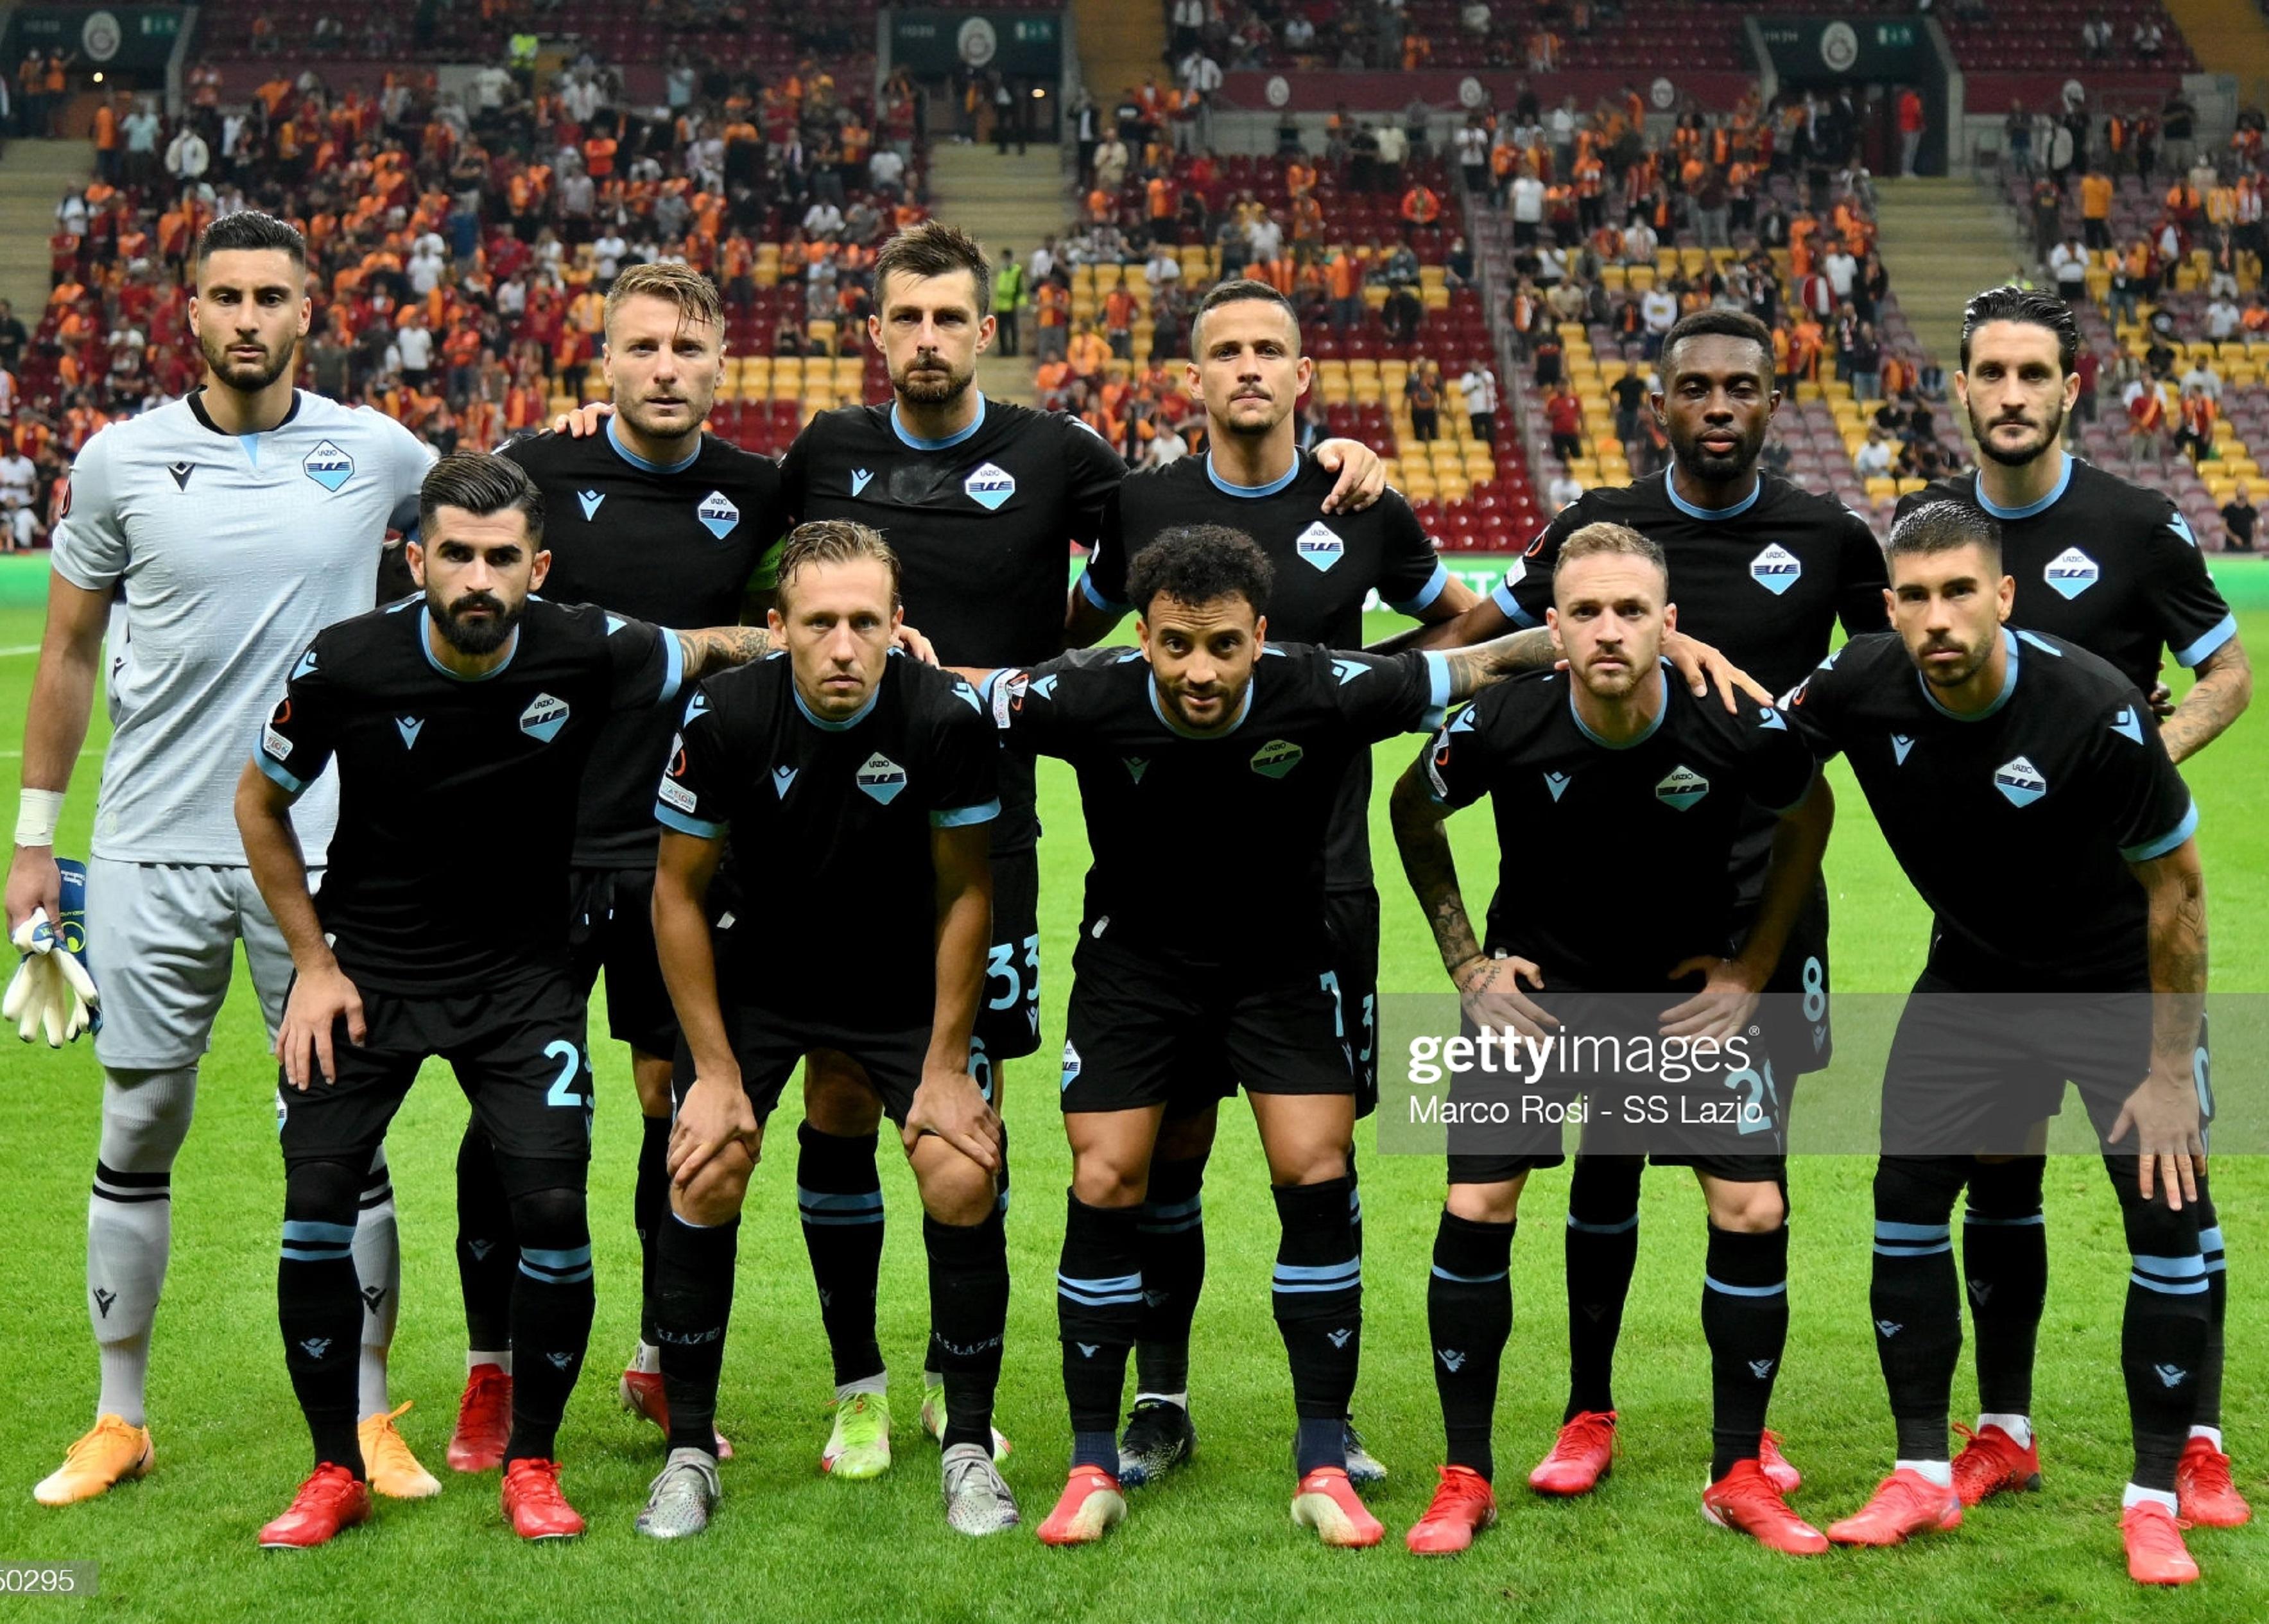 Галатасарай (Турция) - Лацио (Италия) 1:0